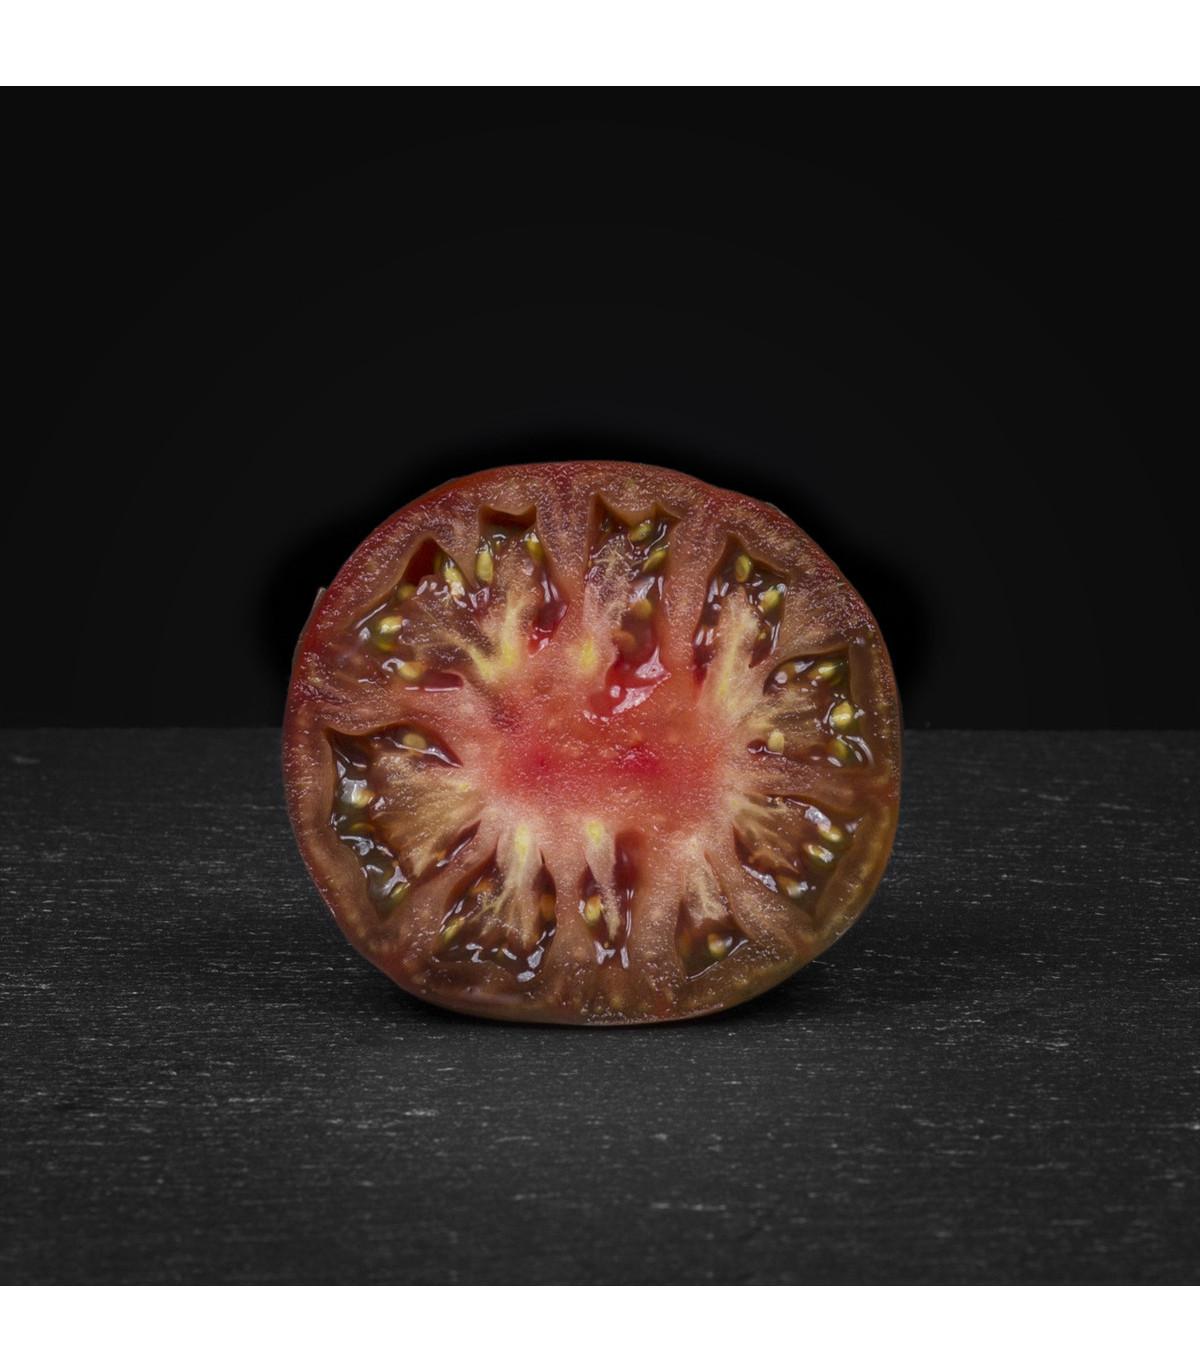 Rajče Černý muž - Lycopersicon esculentum - osivo rajčat - 6 ks